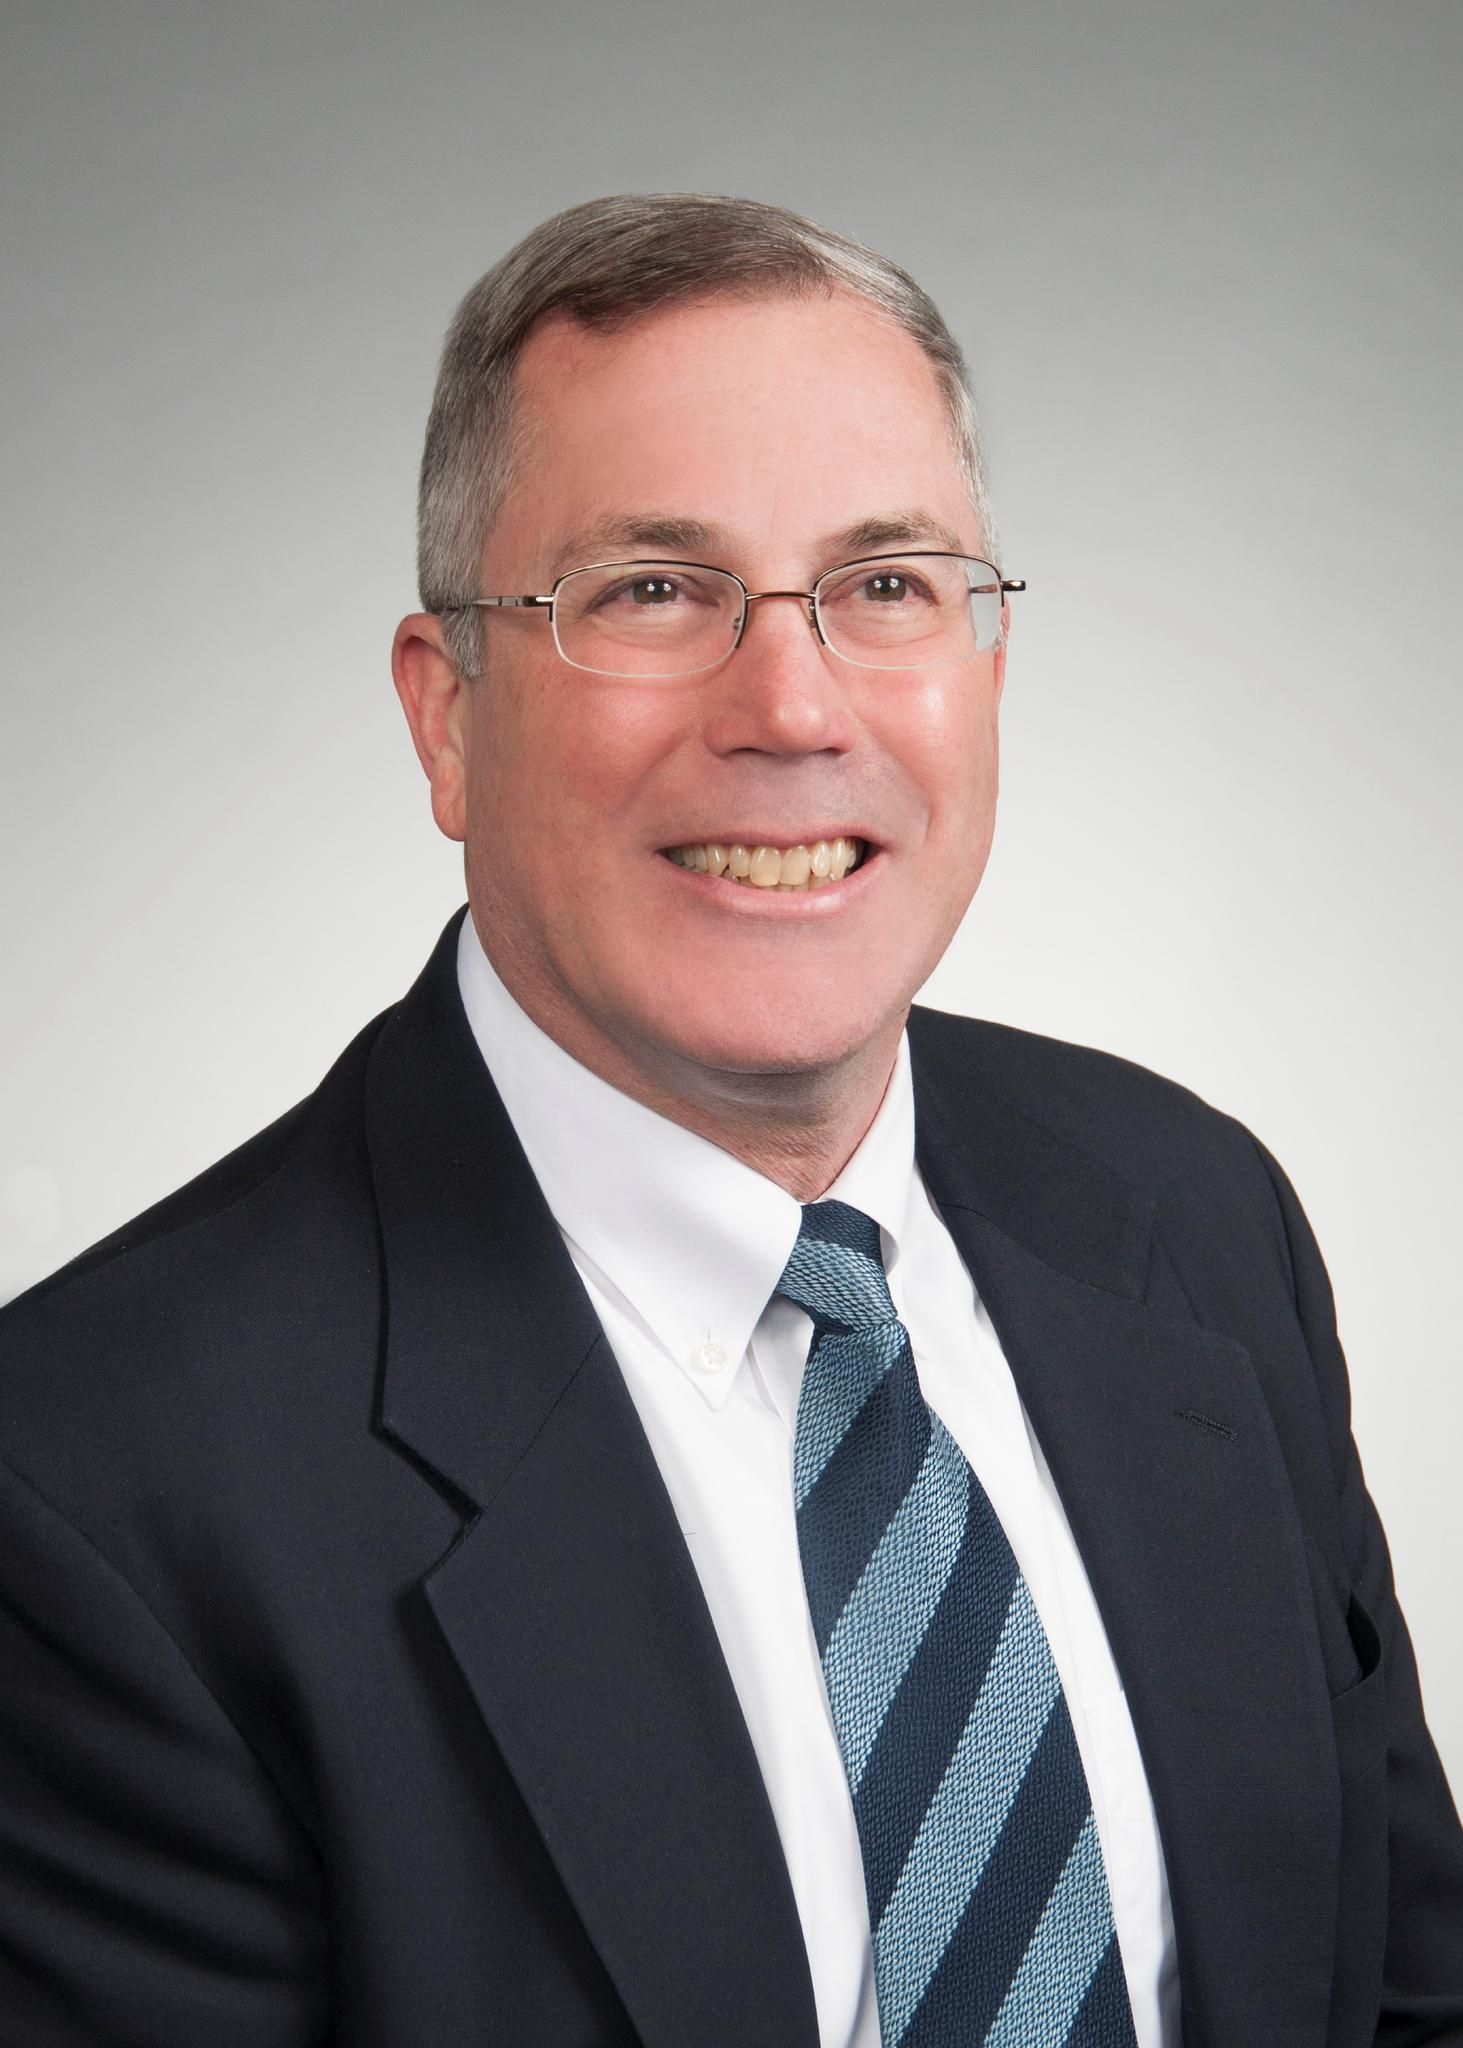 Jim Donohue